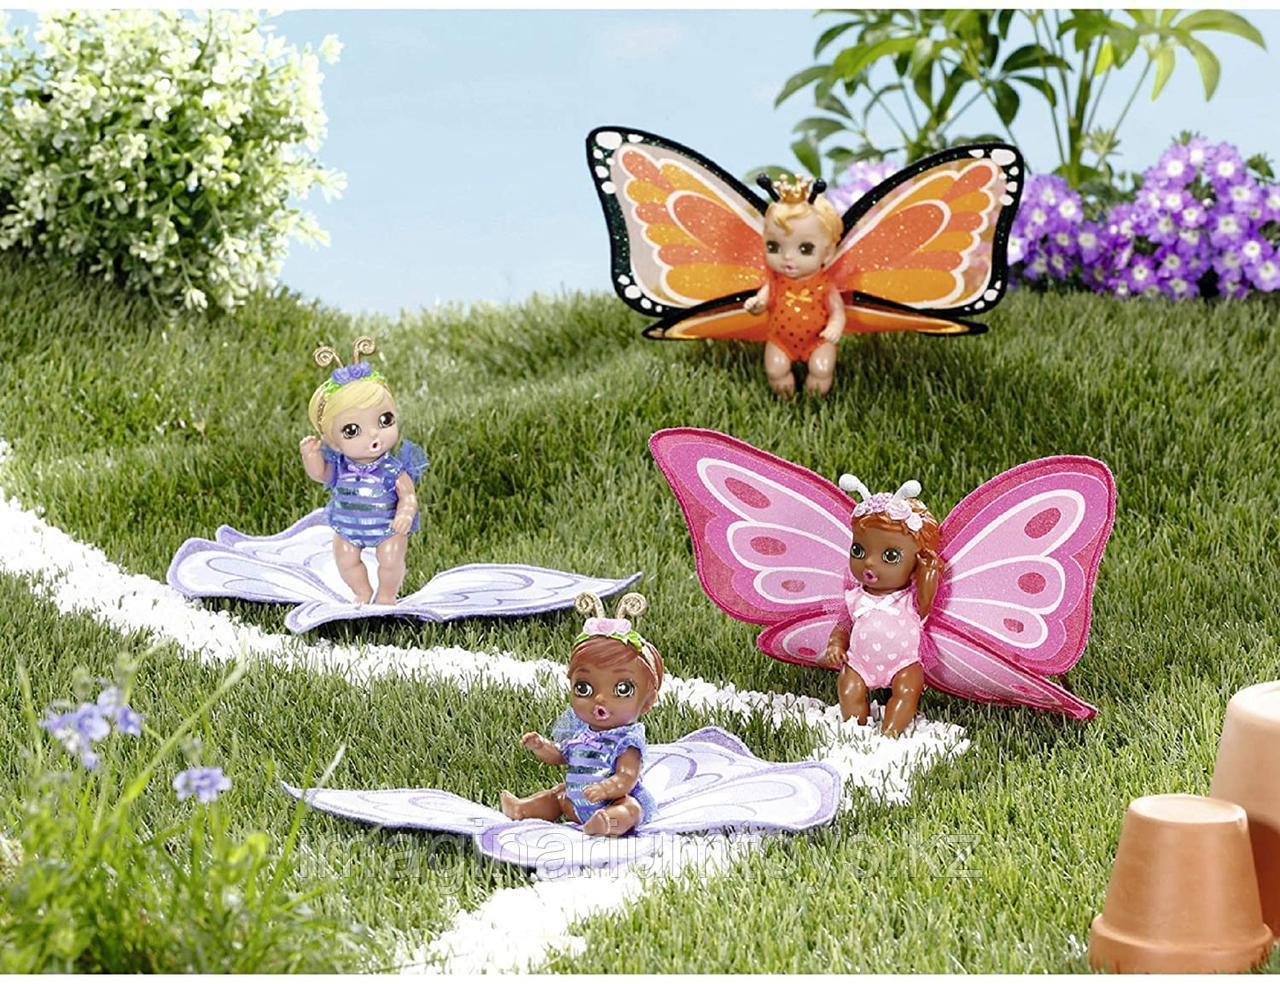 Кукла Baby Born Surprise серия 2 Бабочки оригинал - фото 5